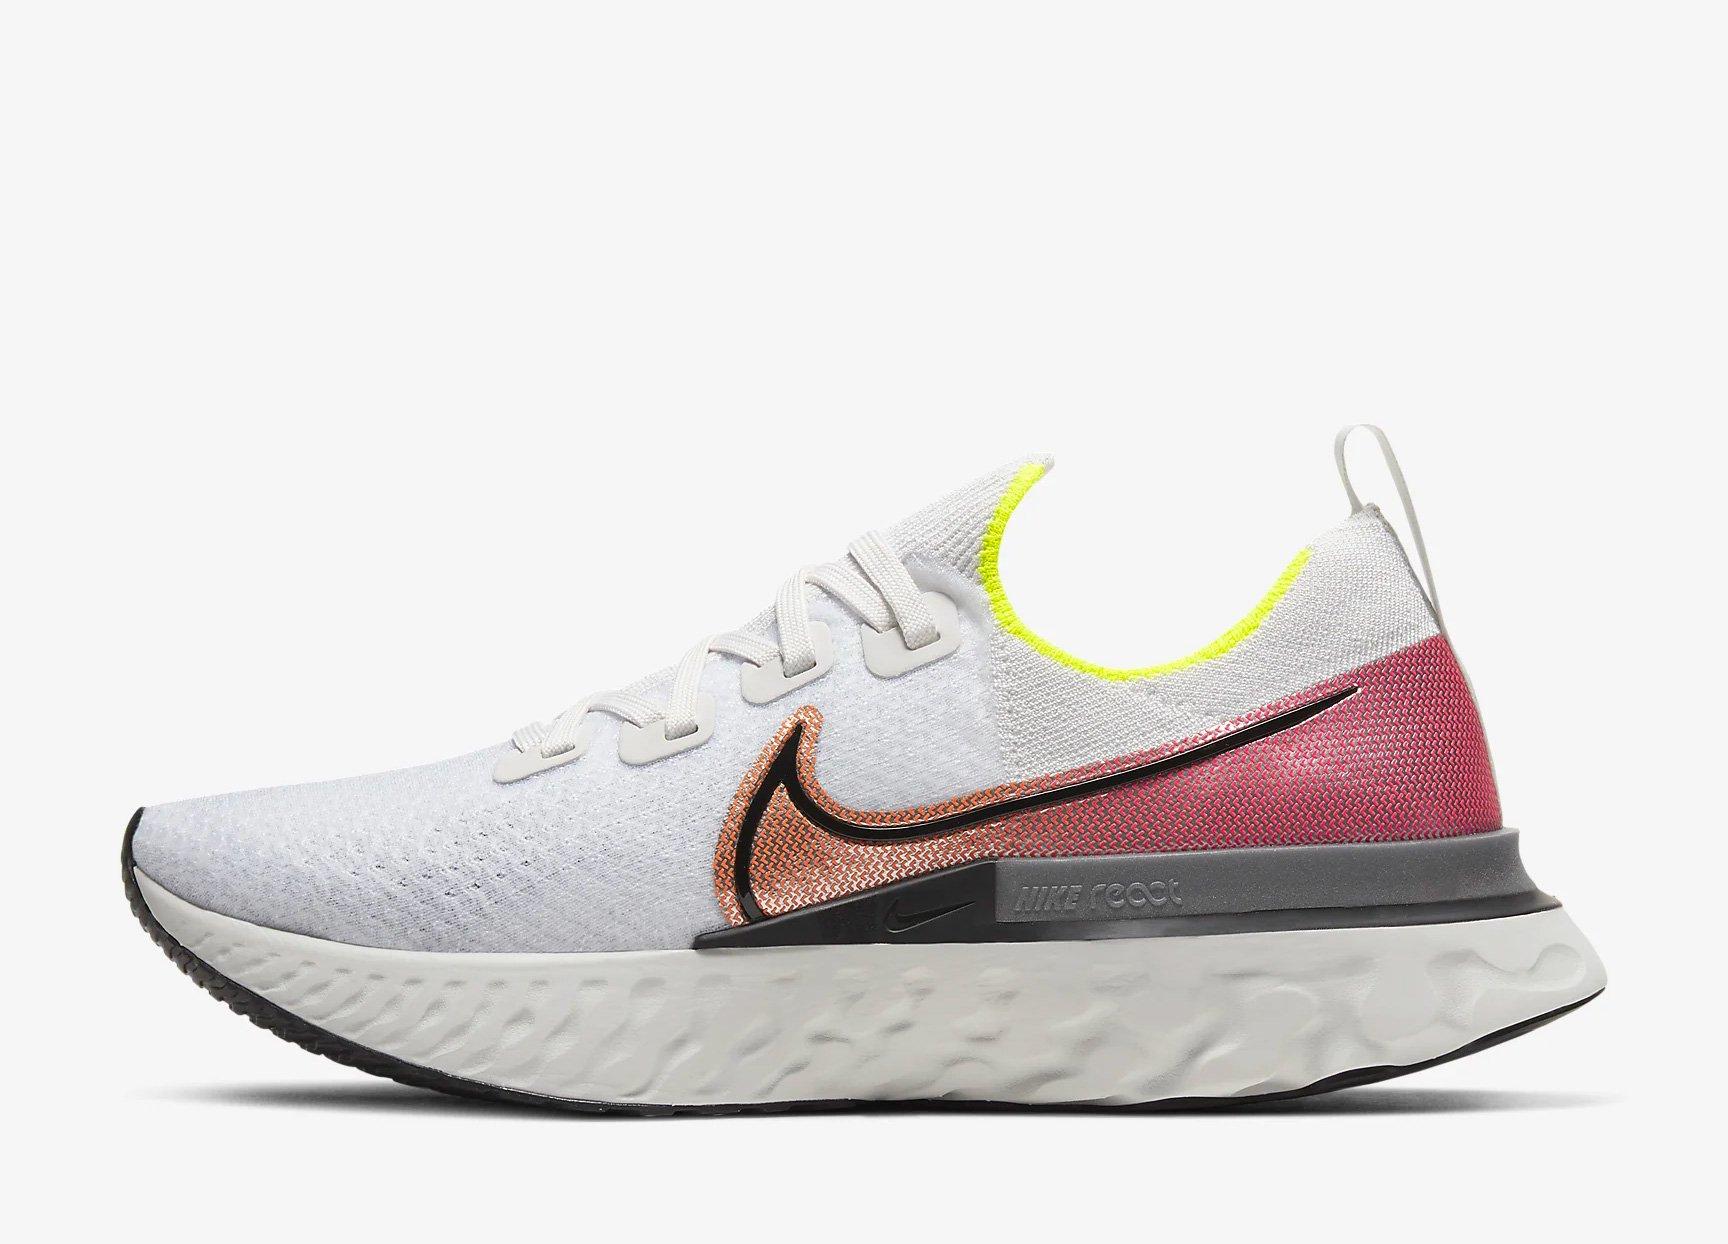 Nike Introduces Injury-Fighting React Infinity Run at werd.com